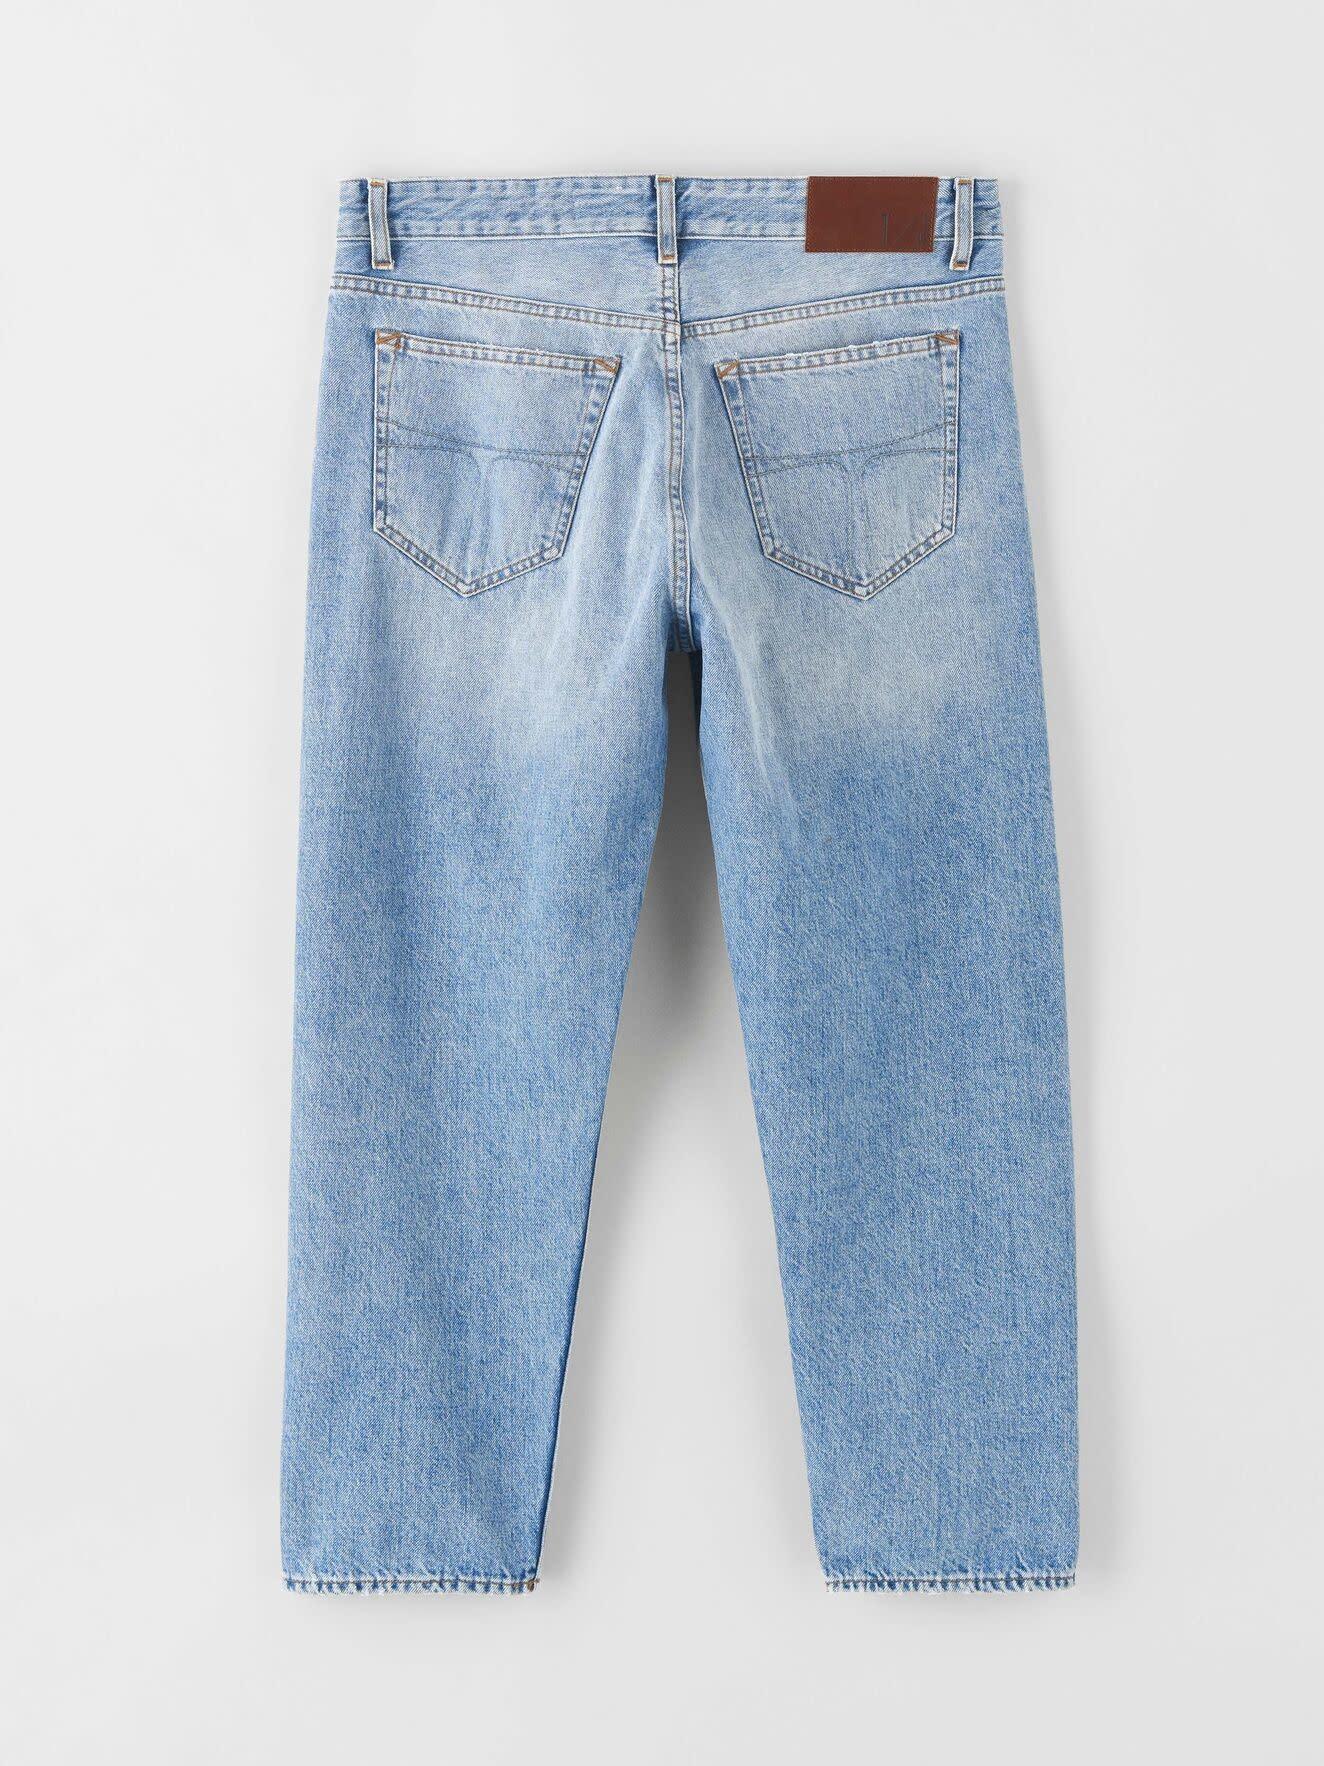 Jud light Blue Jeans Boxer Fit-2